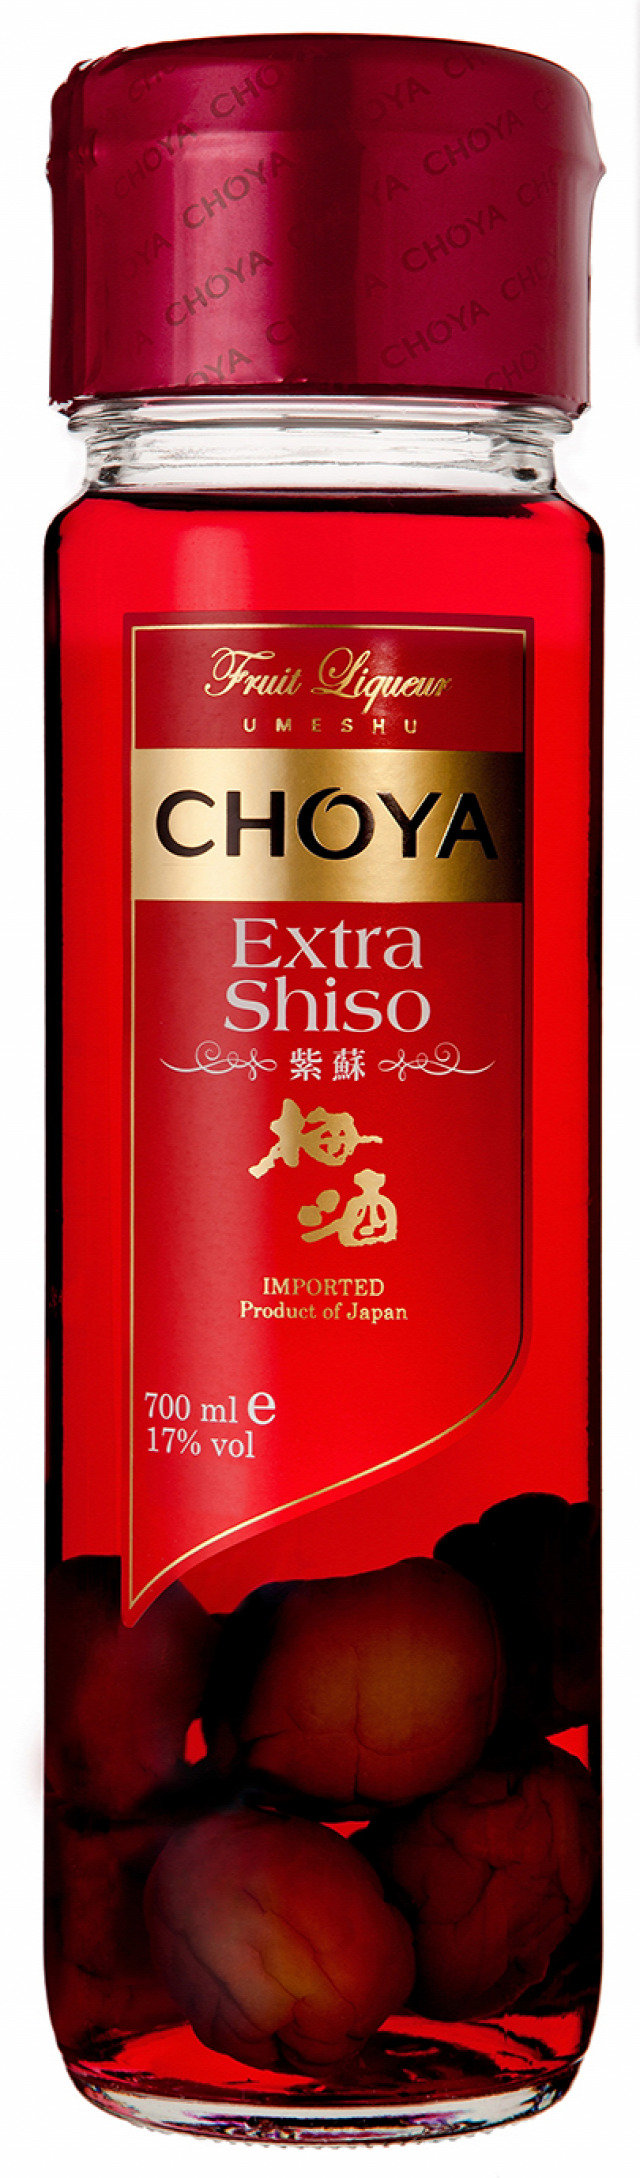 choya takehiko okazaki buddha-bar umeshu